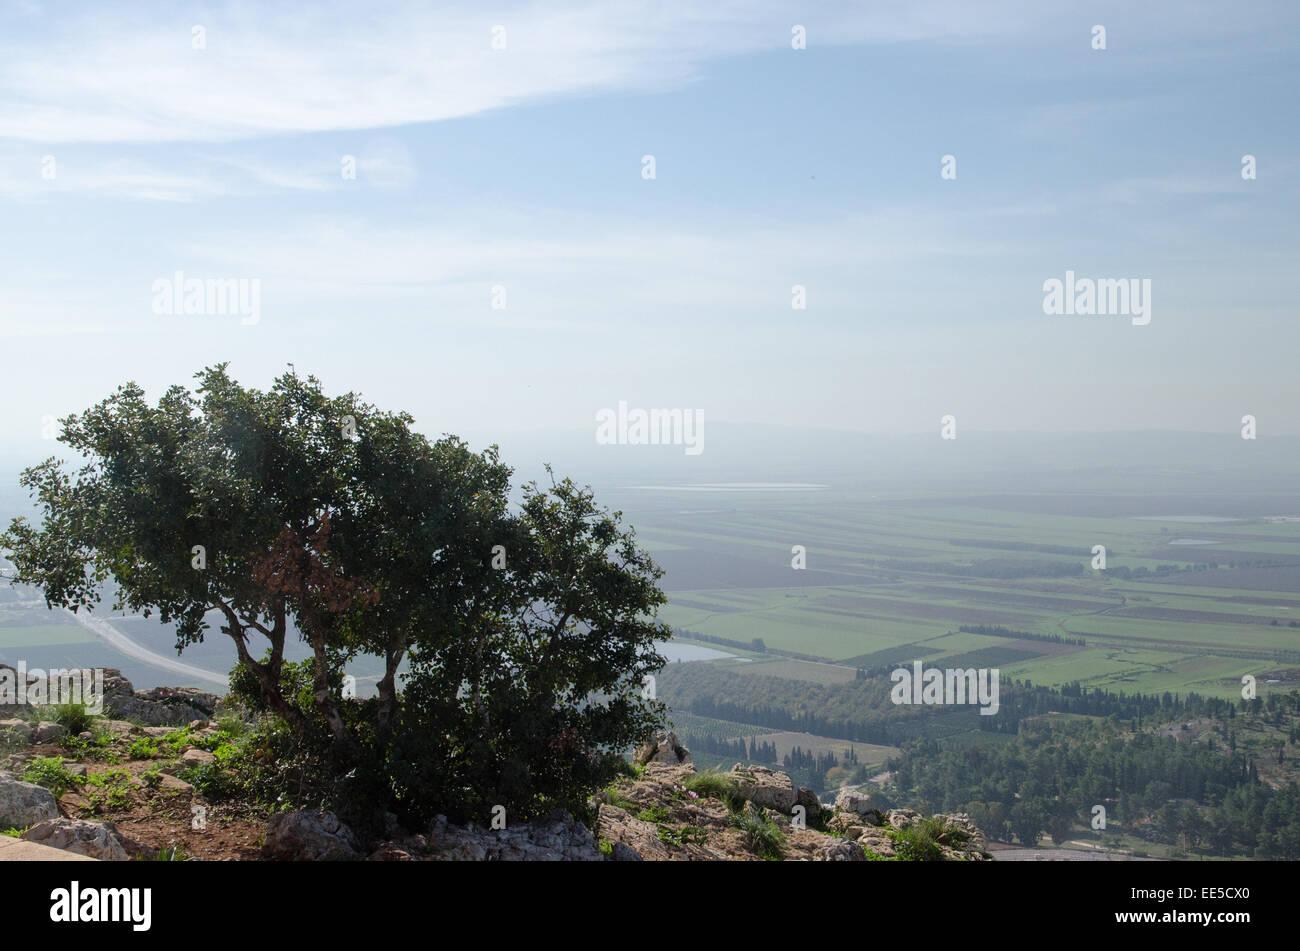 Israel, Lower Galilee, Mount Precipice overlooking Jezreel Valley Stock Photo